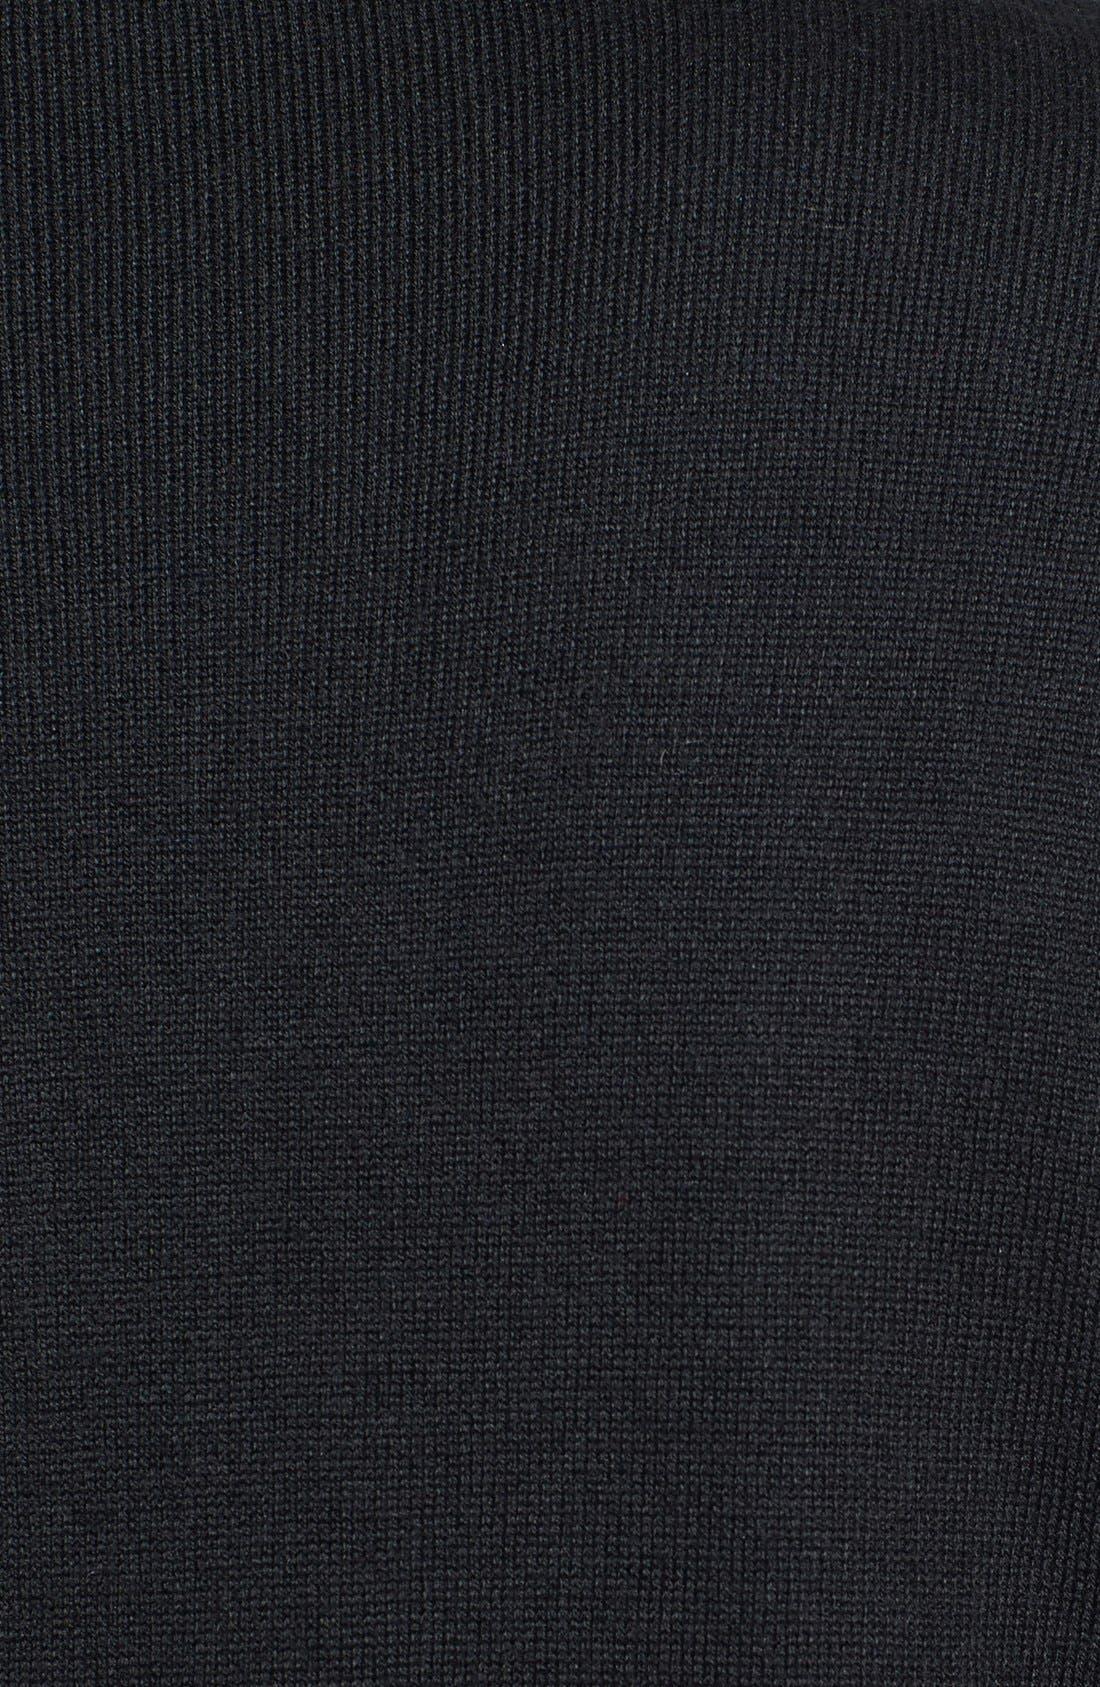 Dolman Sleeve Tunic Sweater,                             Alternate thumbnail 3, color,                             Rich Black